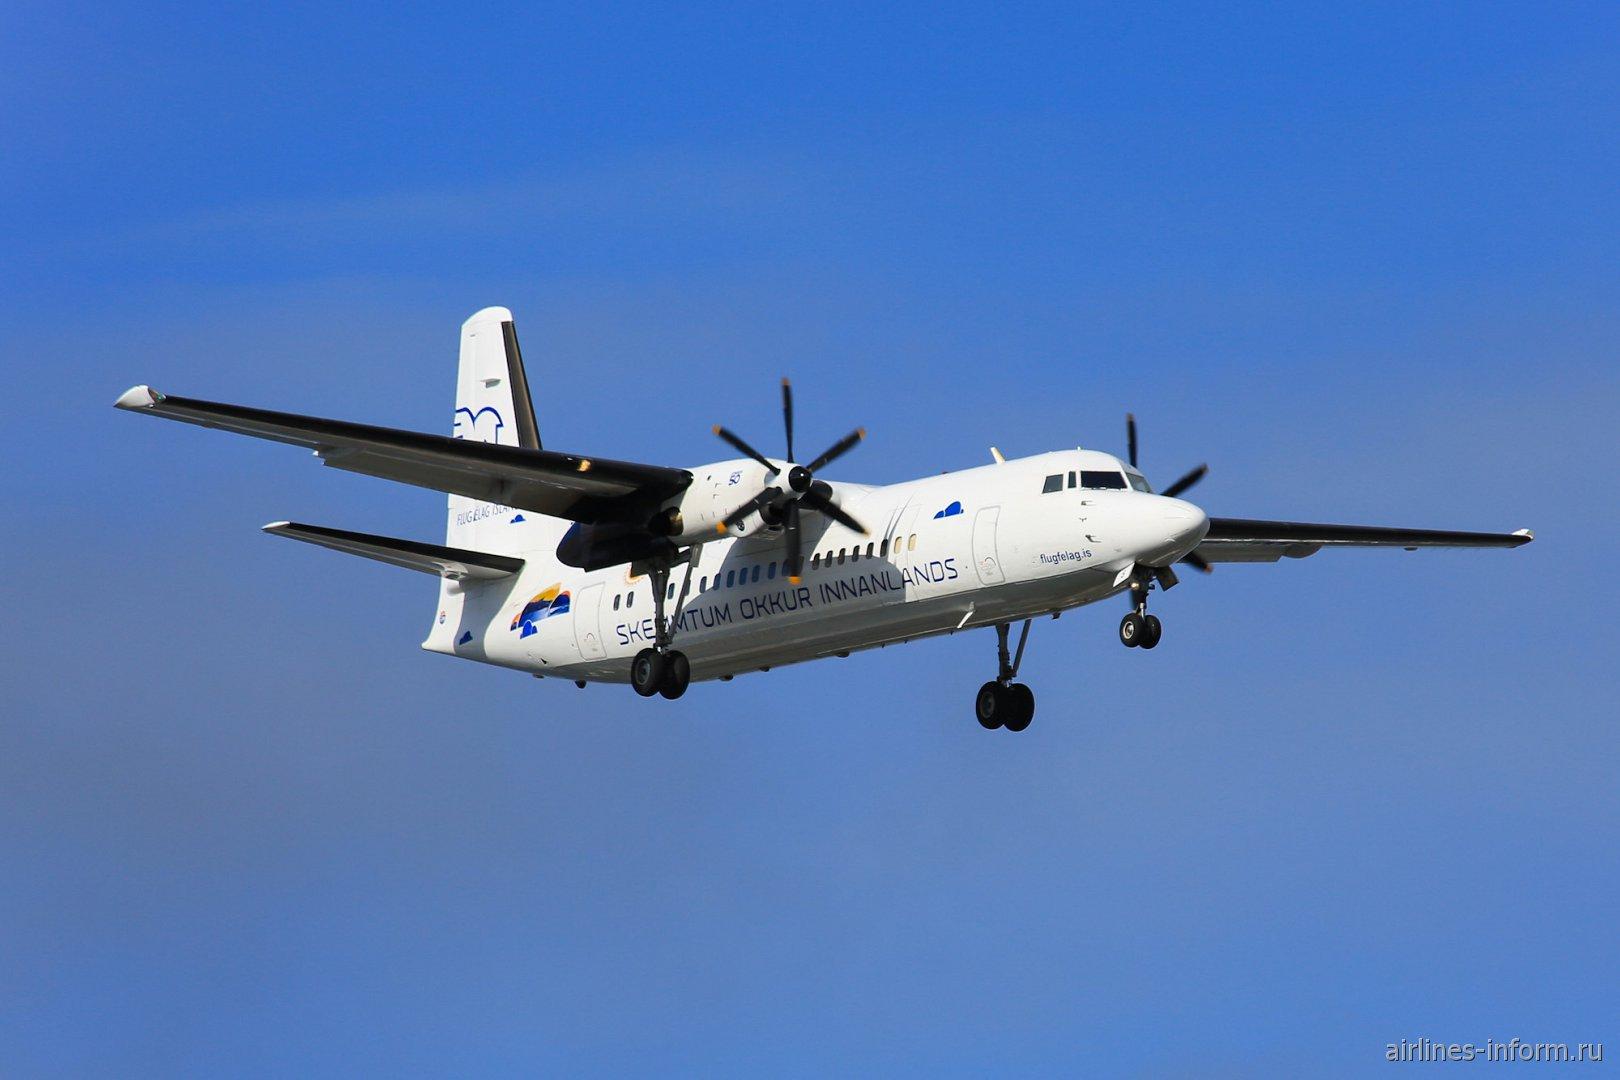 Самолет Fokker 50 авиакомпании Air Iceland